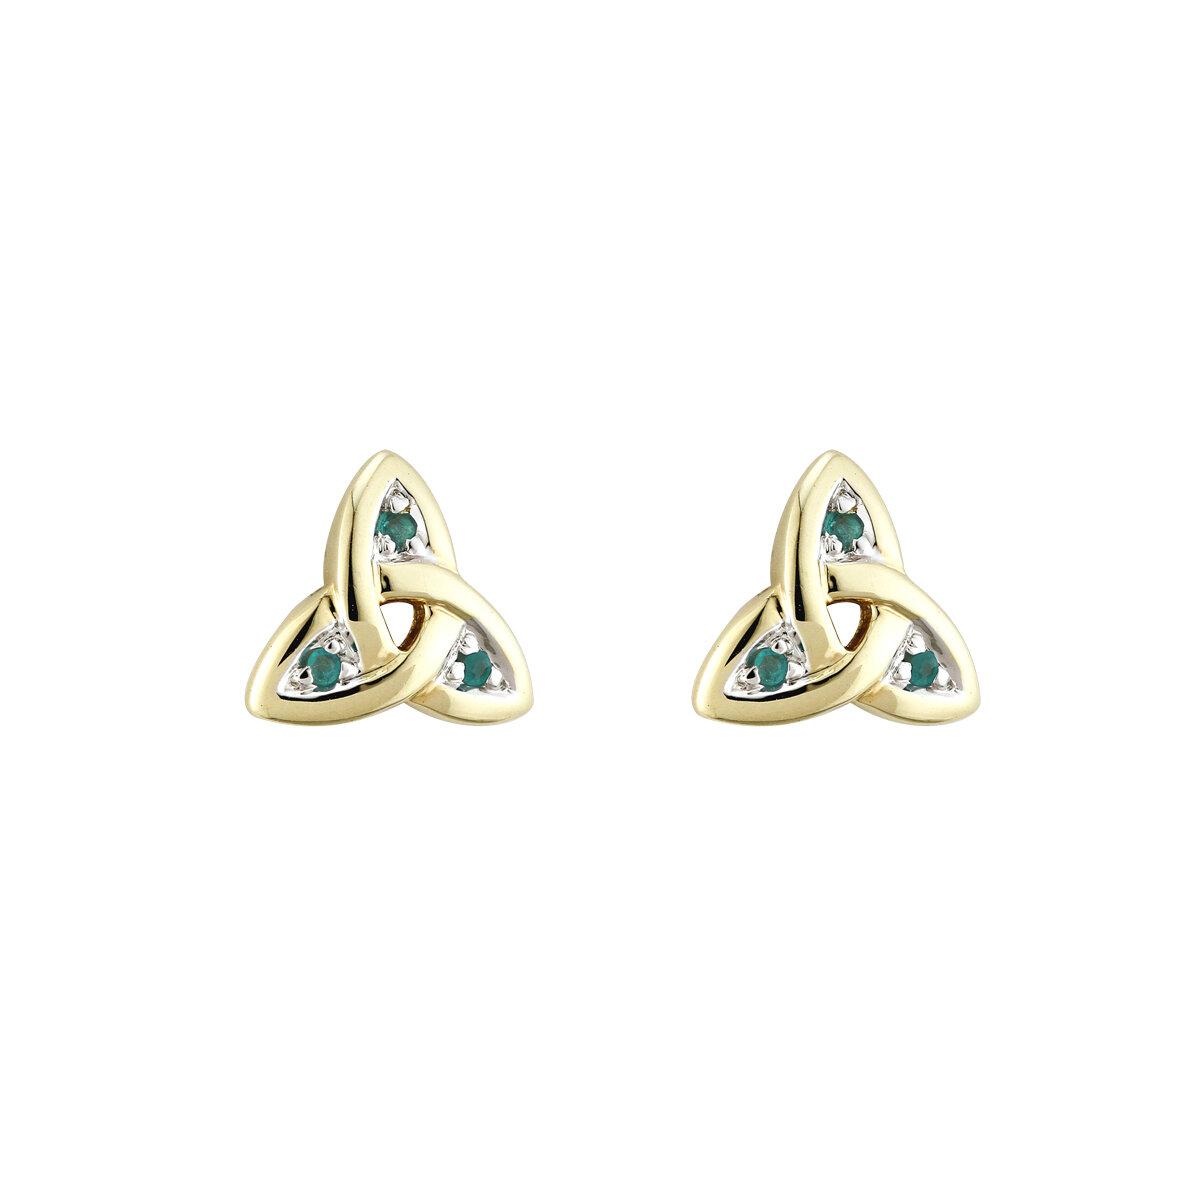 14K gold emerald trinity knot stud earrings s3006 from Solvar